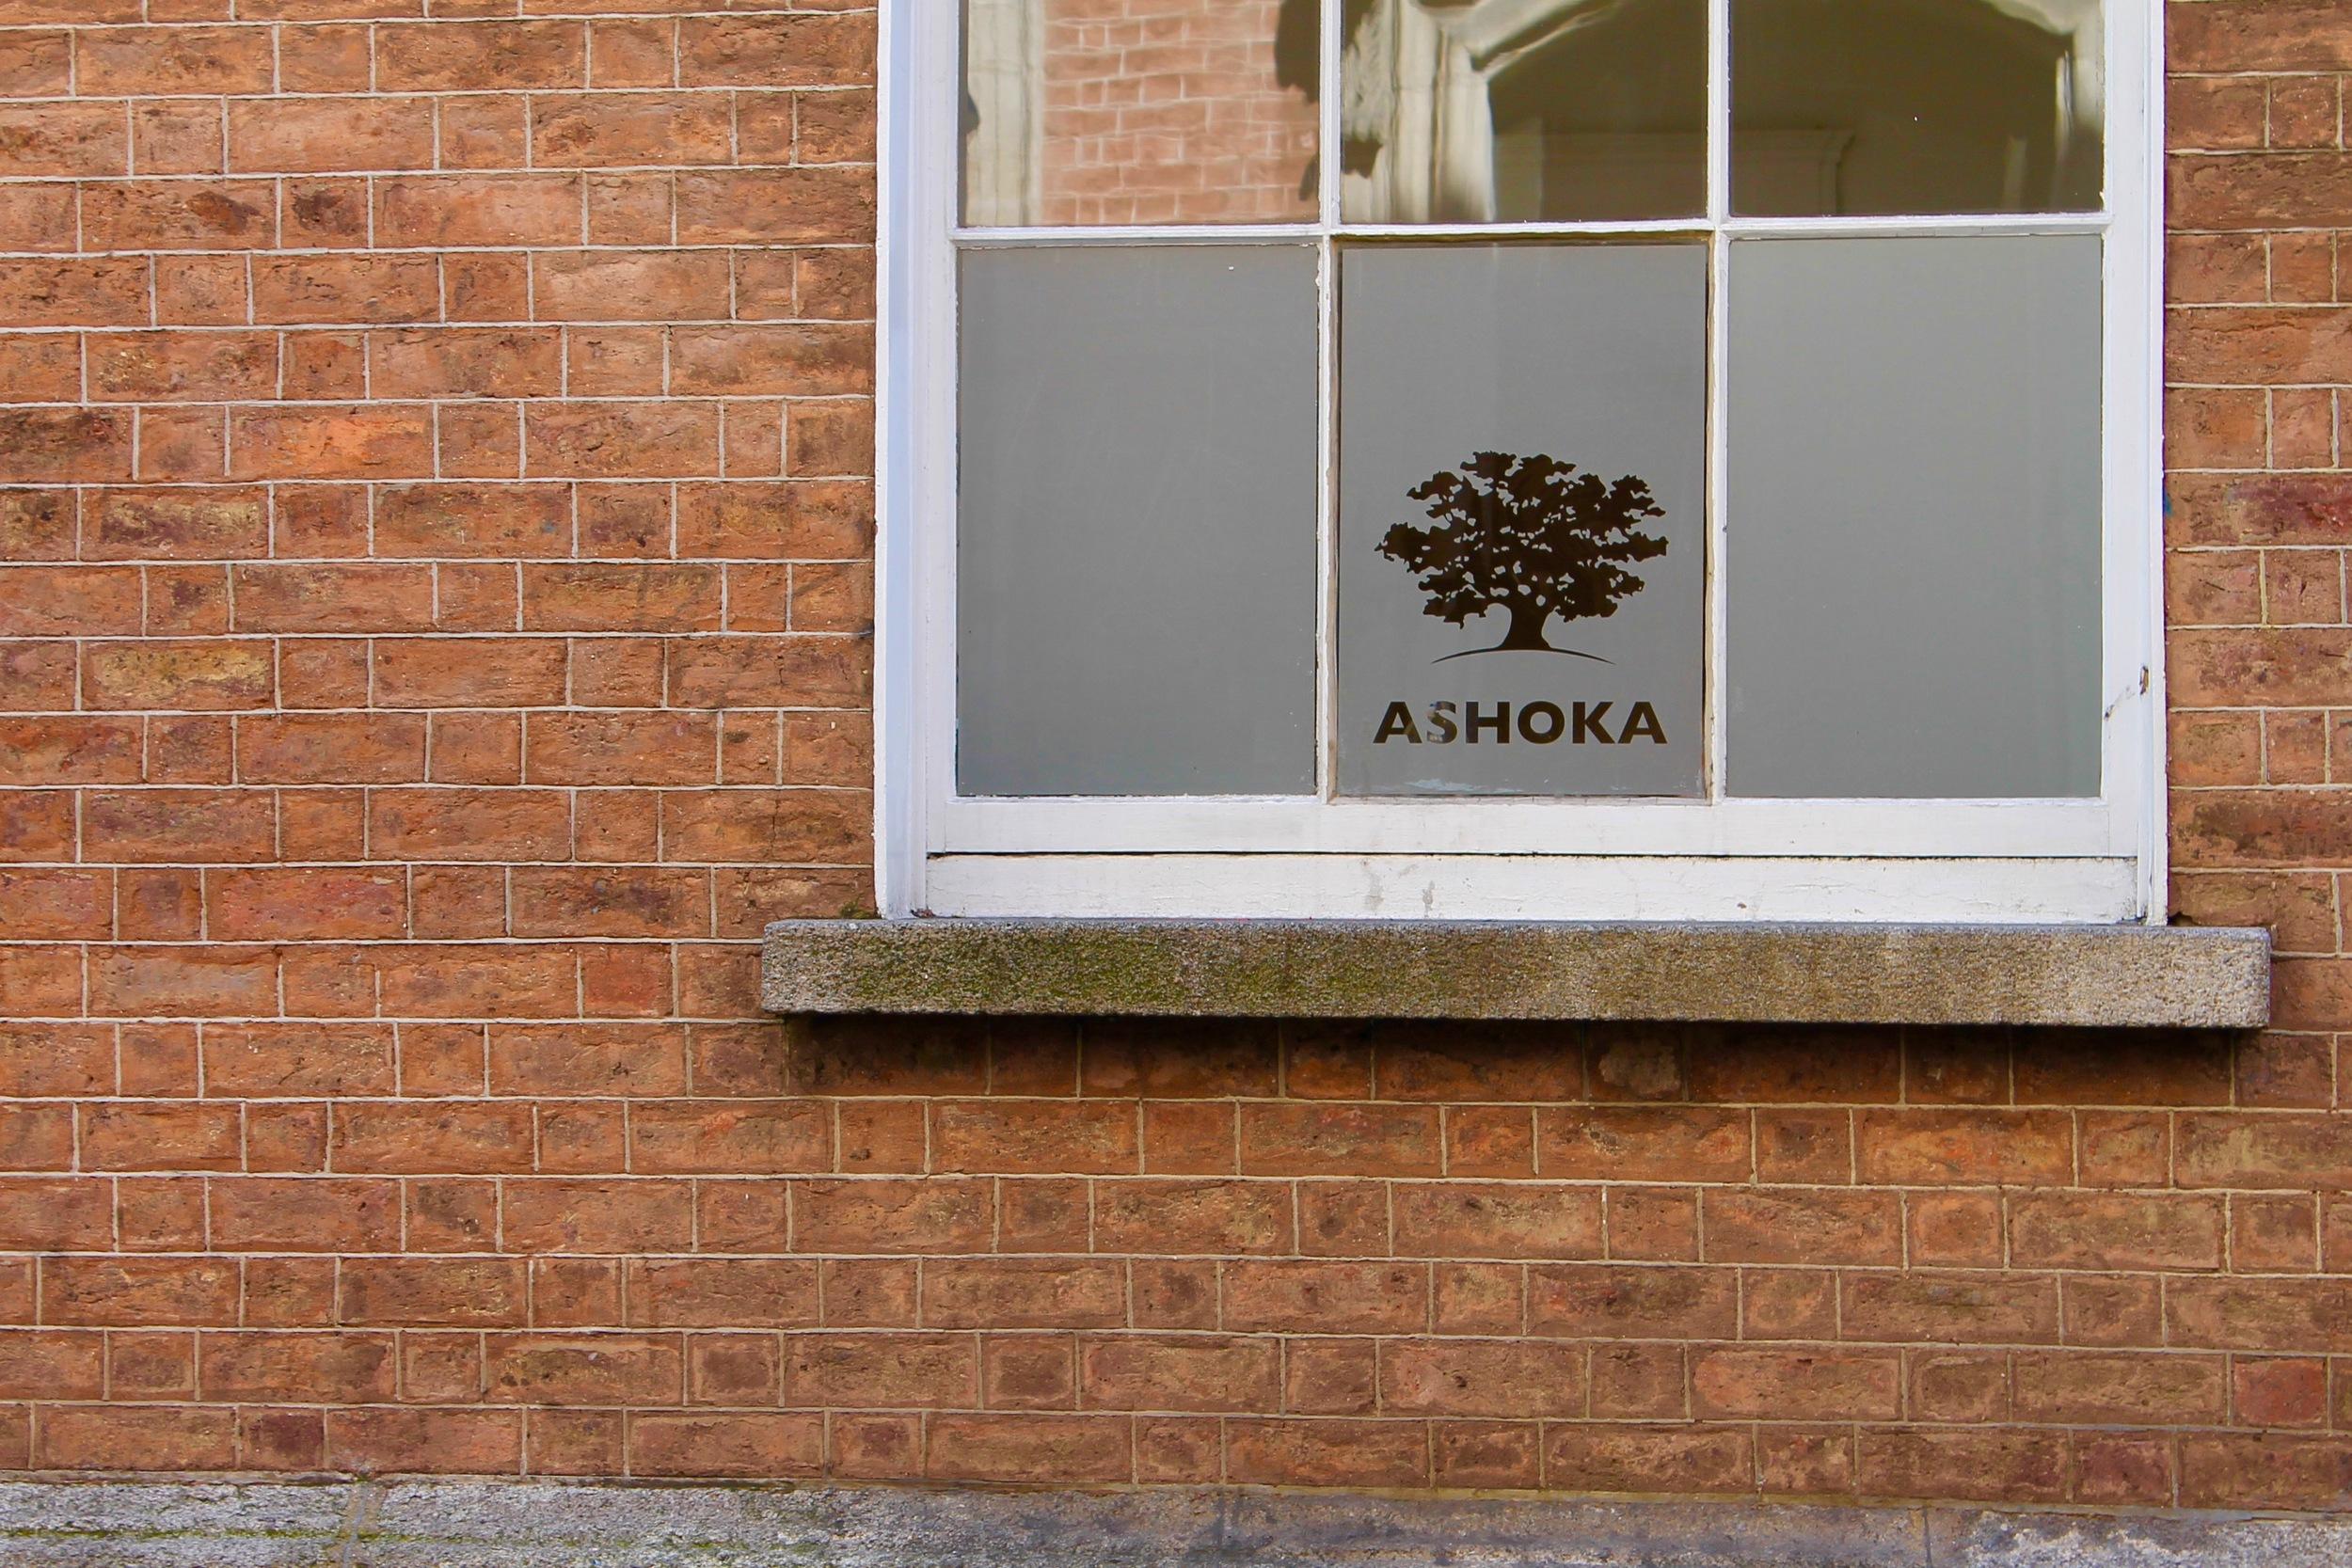 Ashoka Ireland is headquartered at 23 South William Street, Dublin 2.